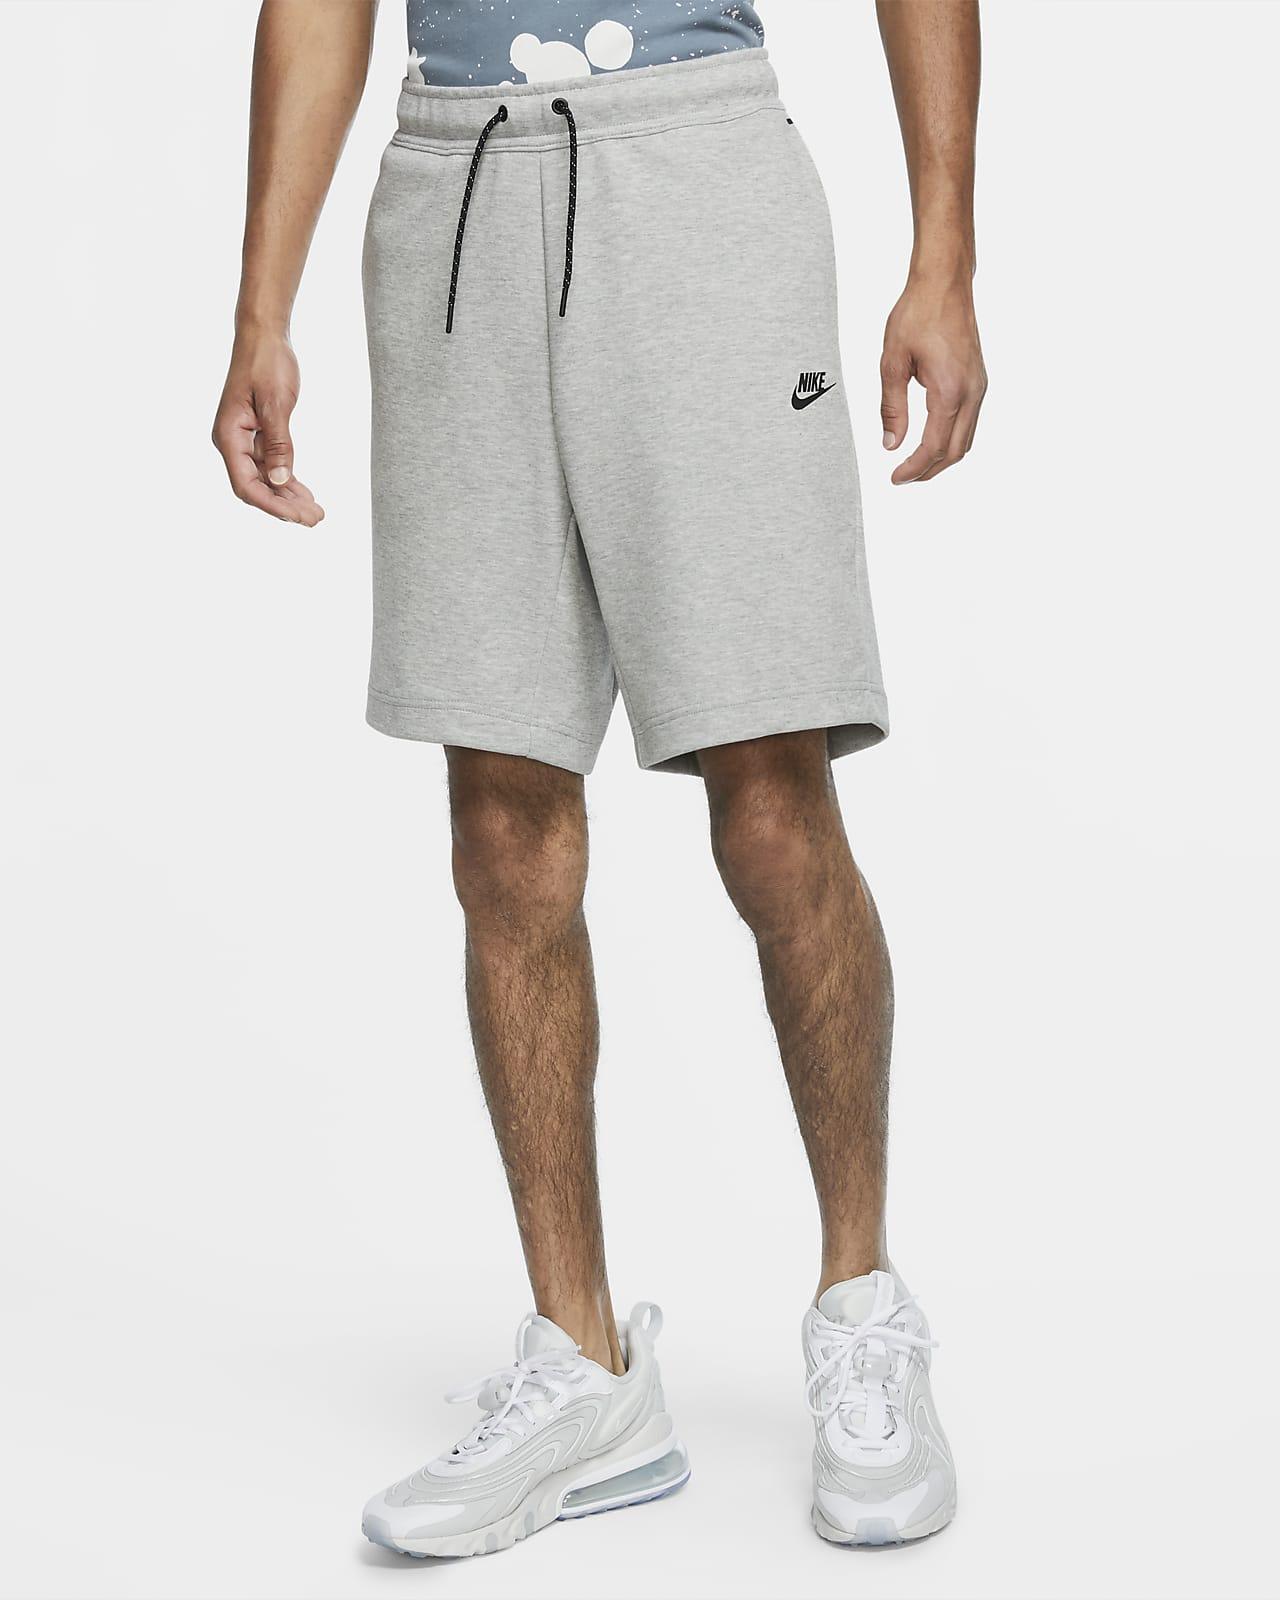 Shorts para hombre Nike Sportswear Tech Fleece